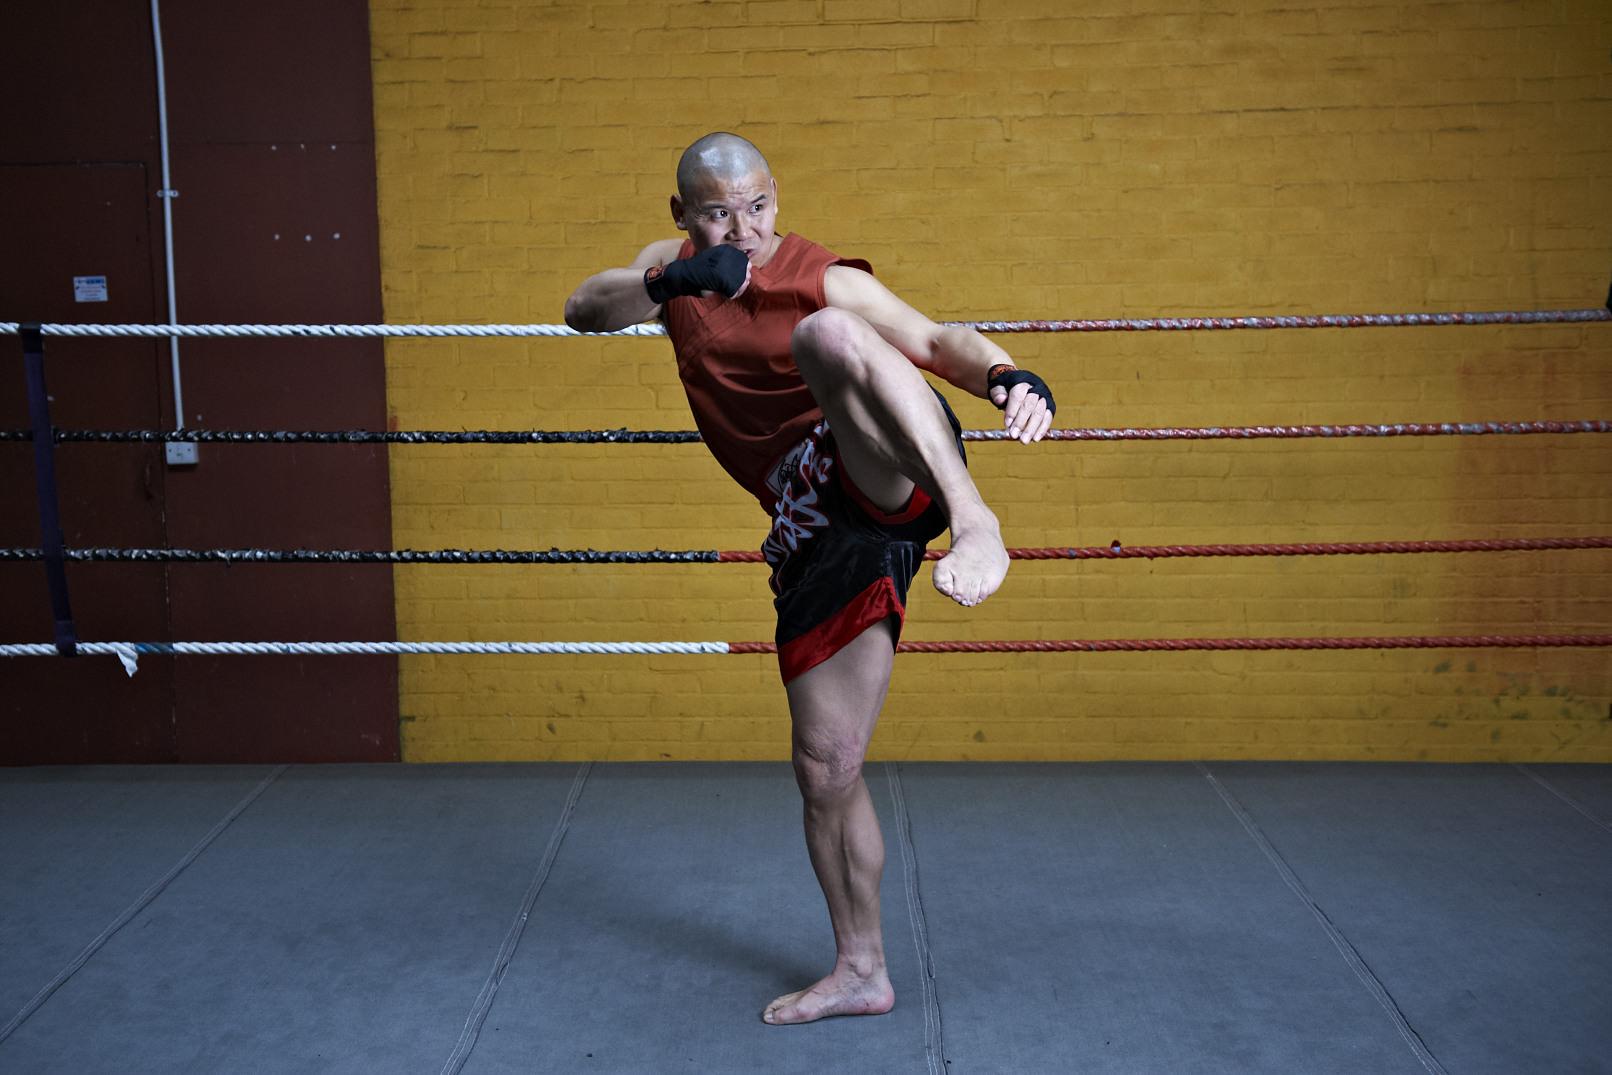 Shaolin temple uk shifu yanzi kick 30.jpg